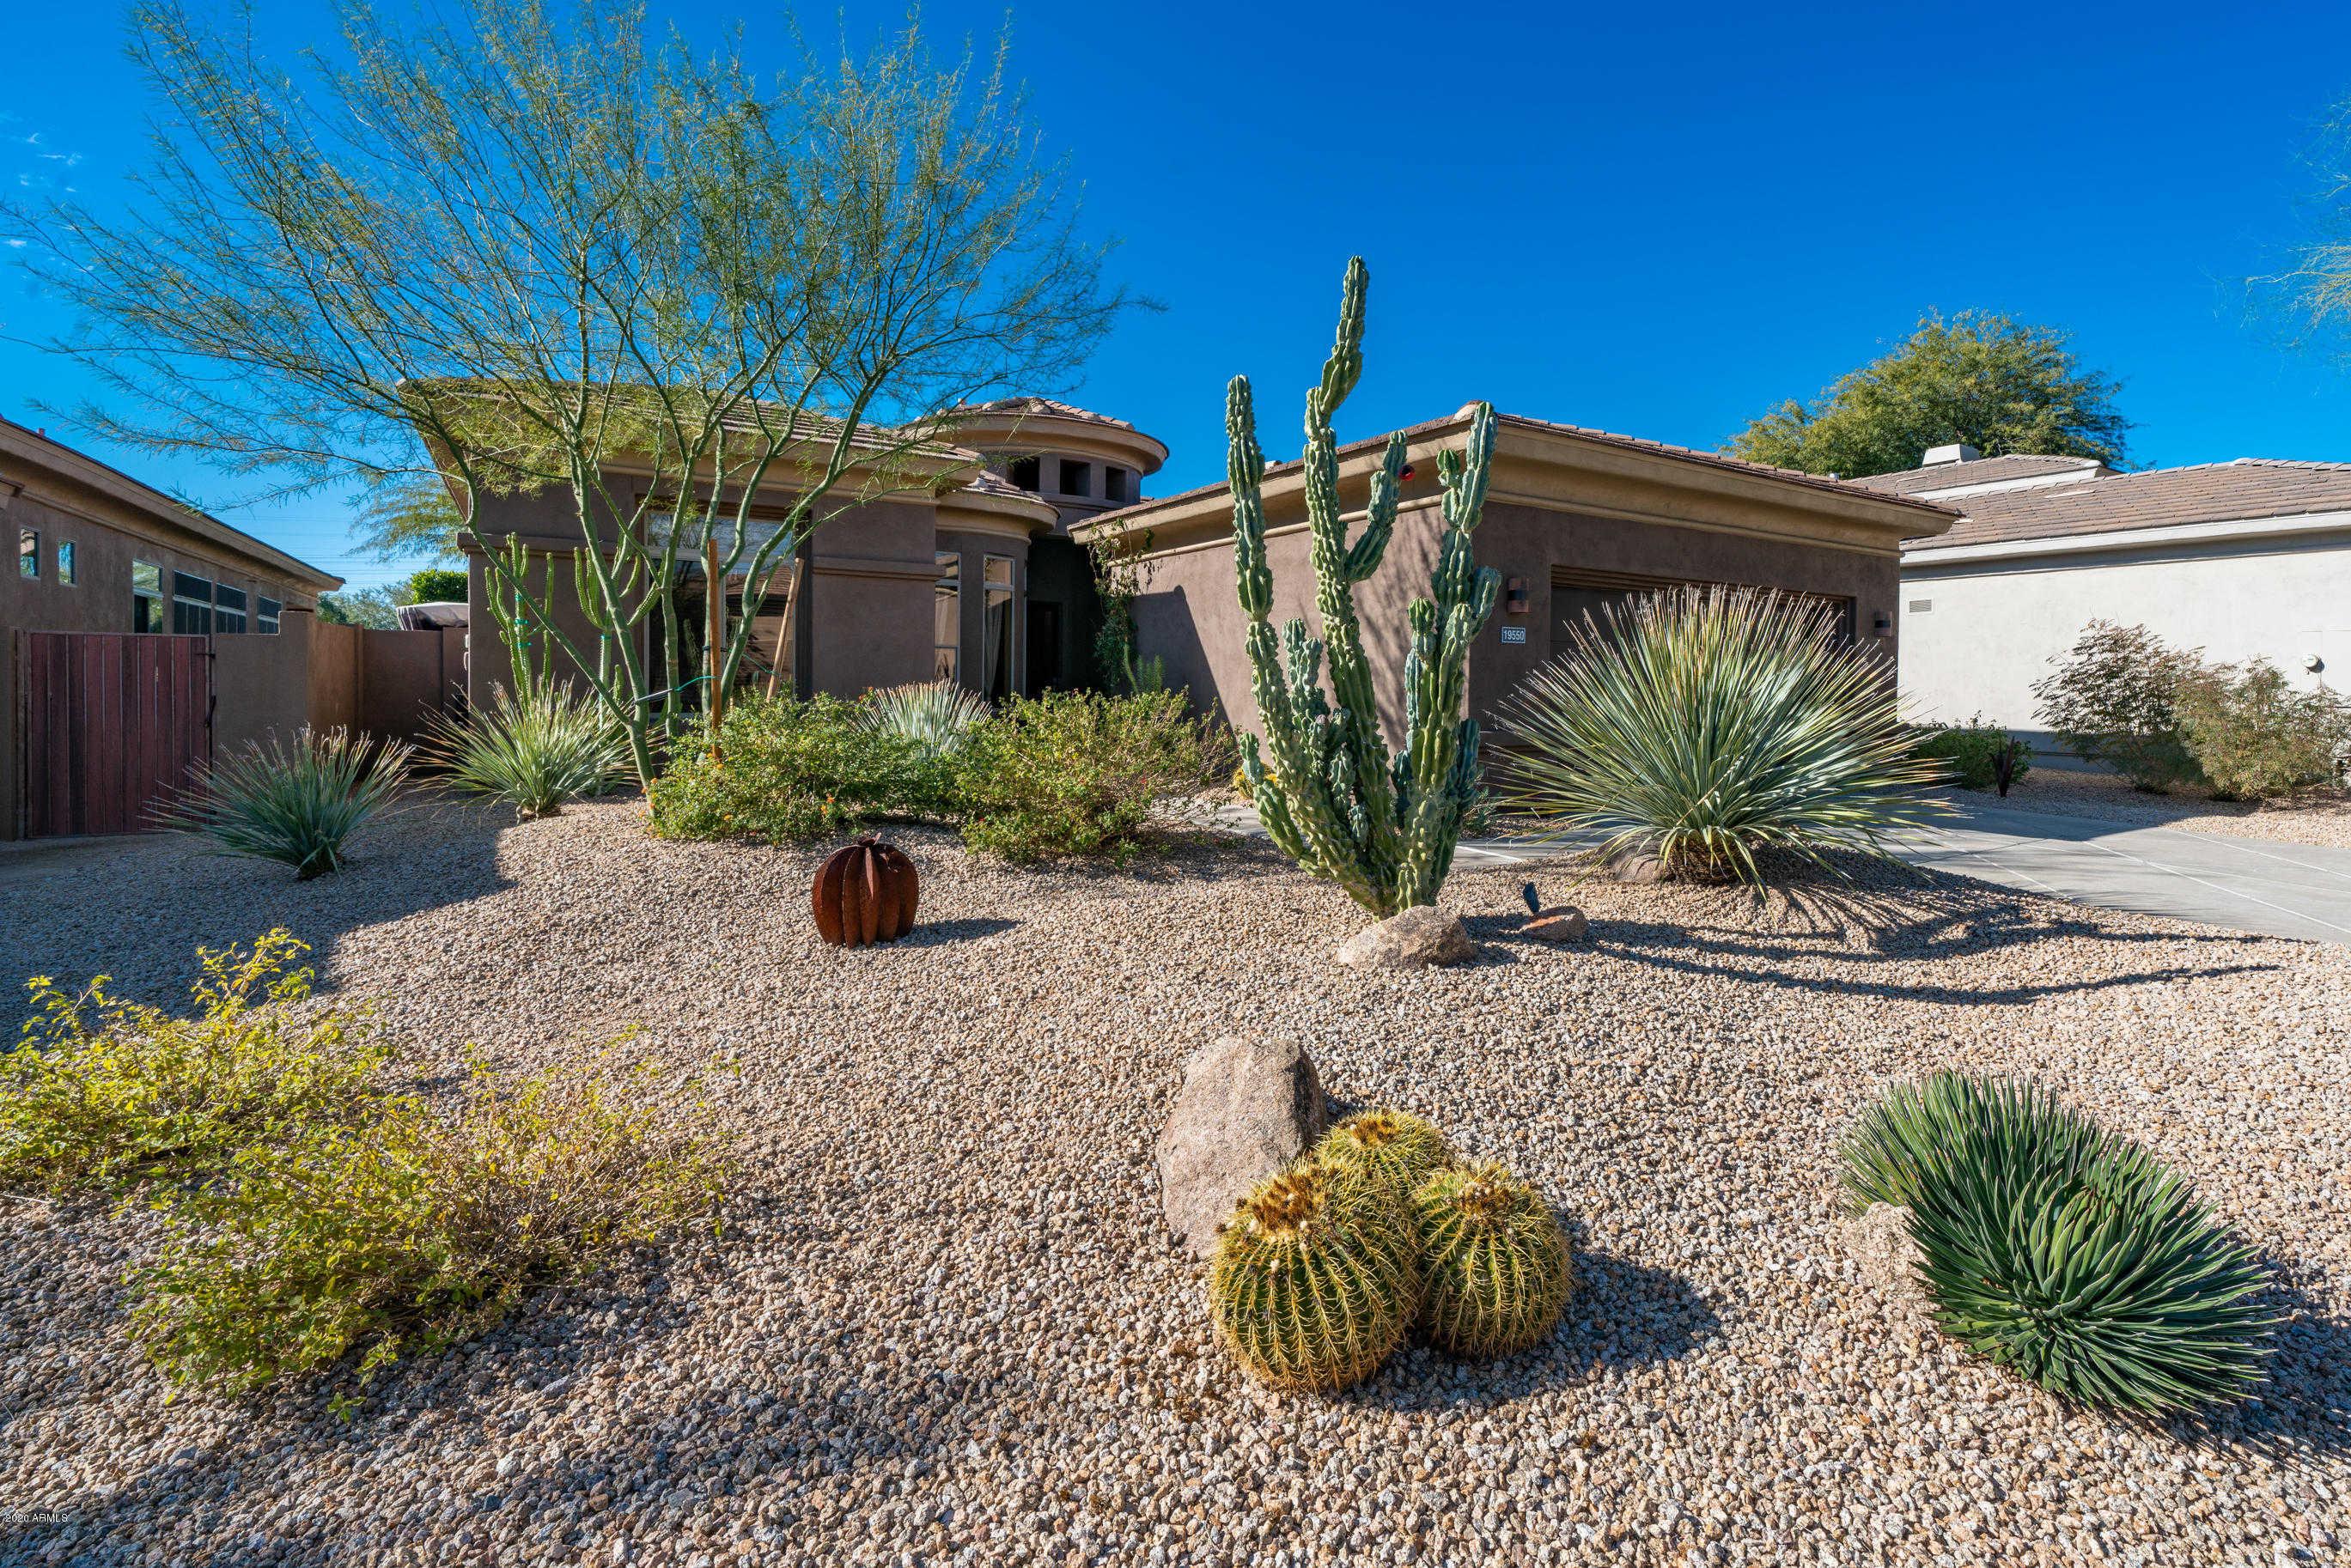 $886,000 - 2Br/3Ba - Home for Sale in Grayhawk Parcel 3k(a), Scottsdale